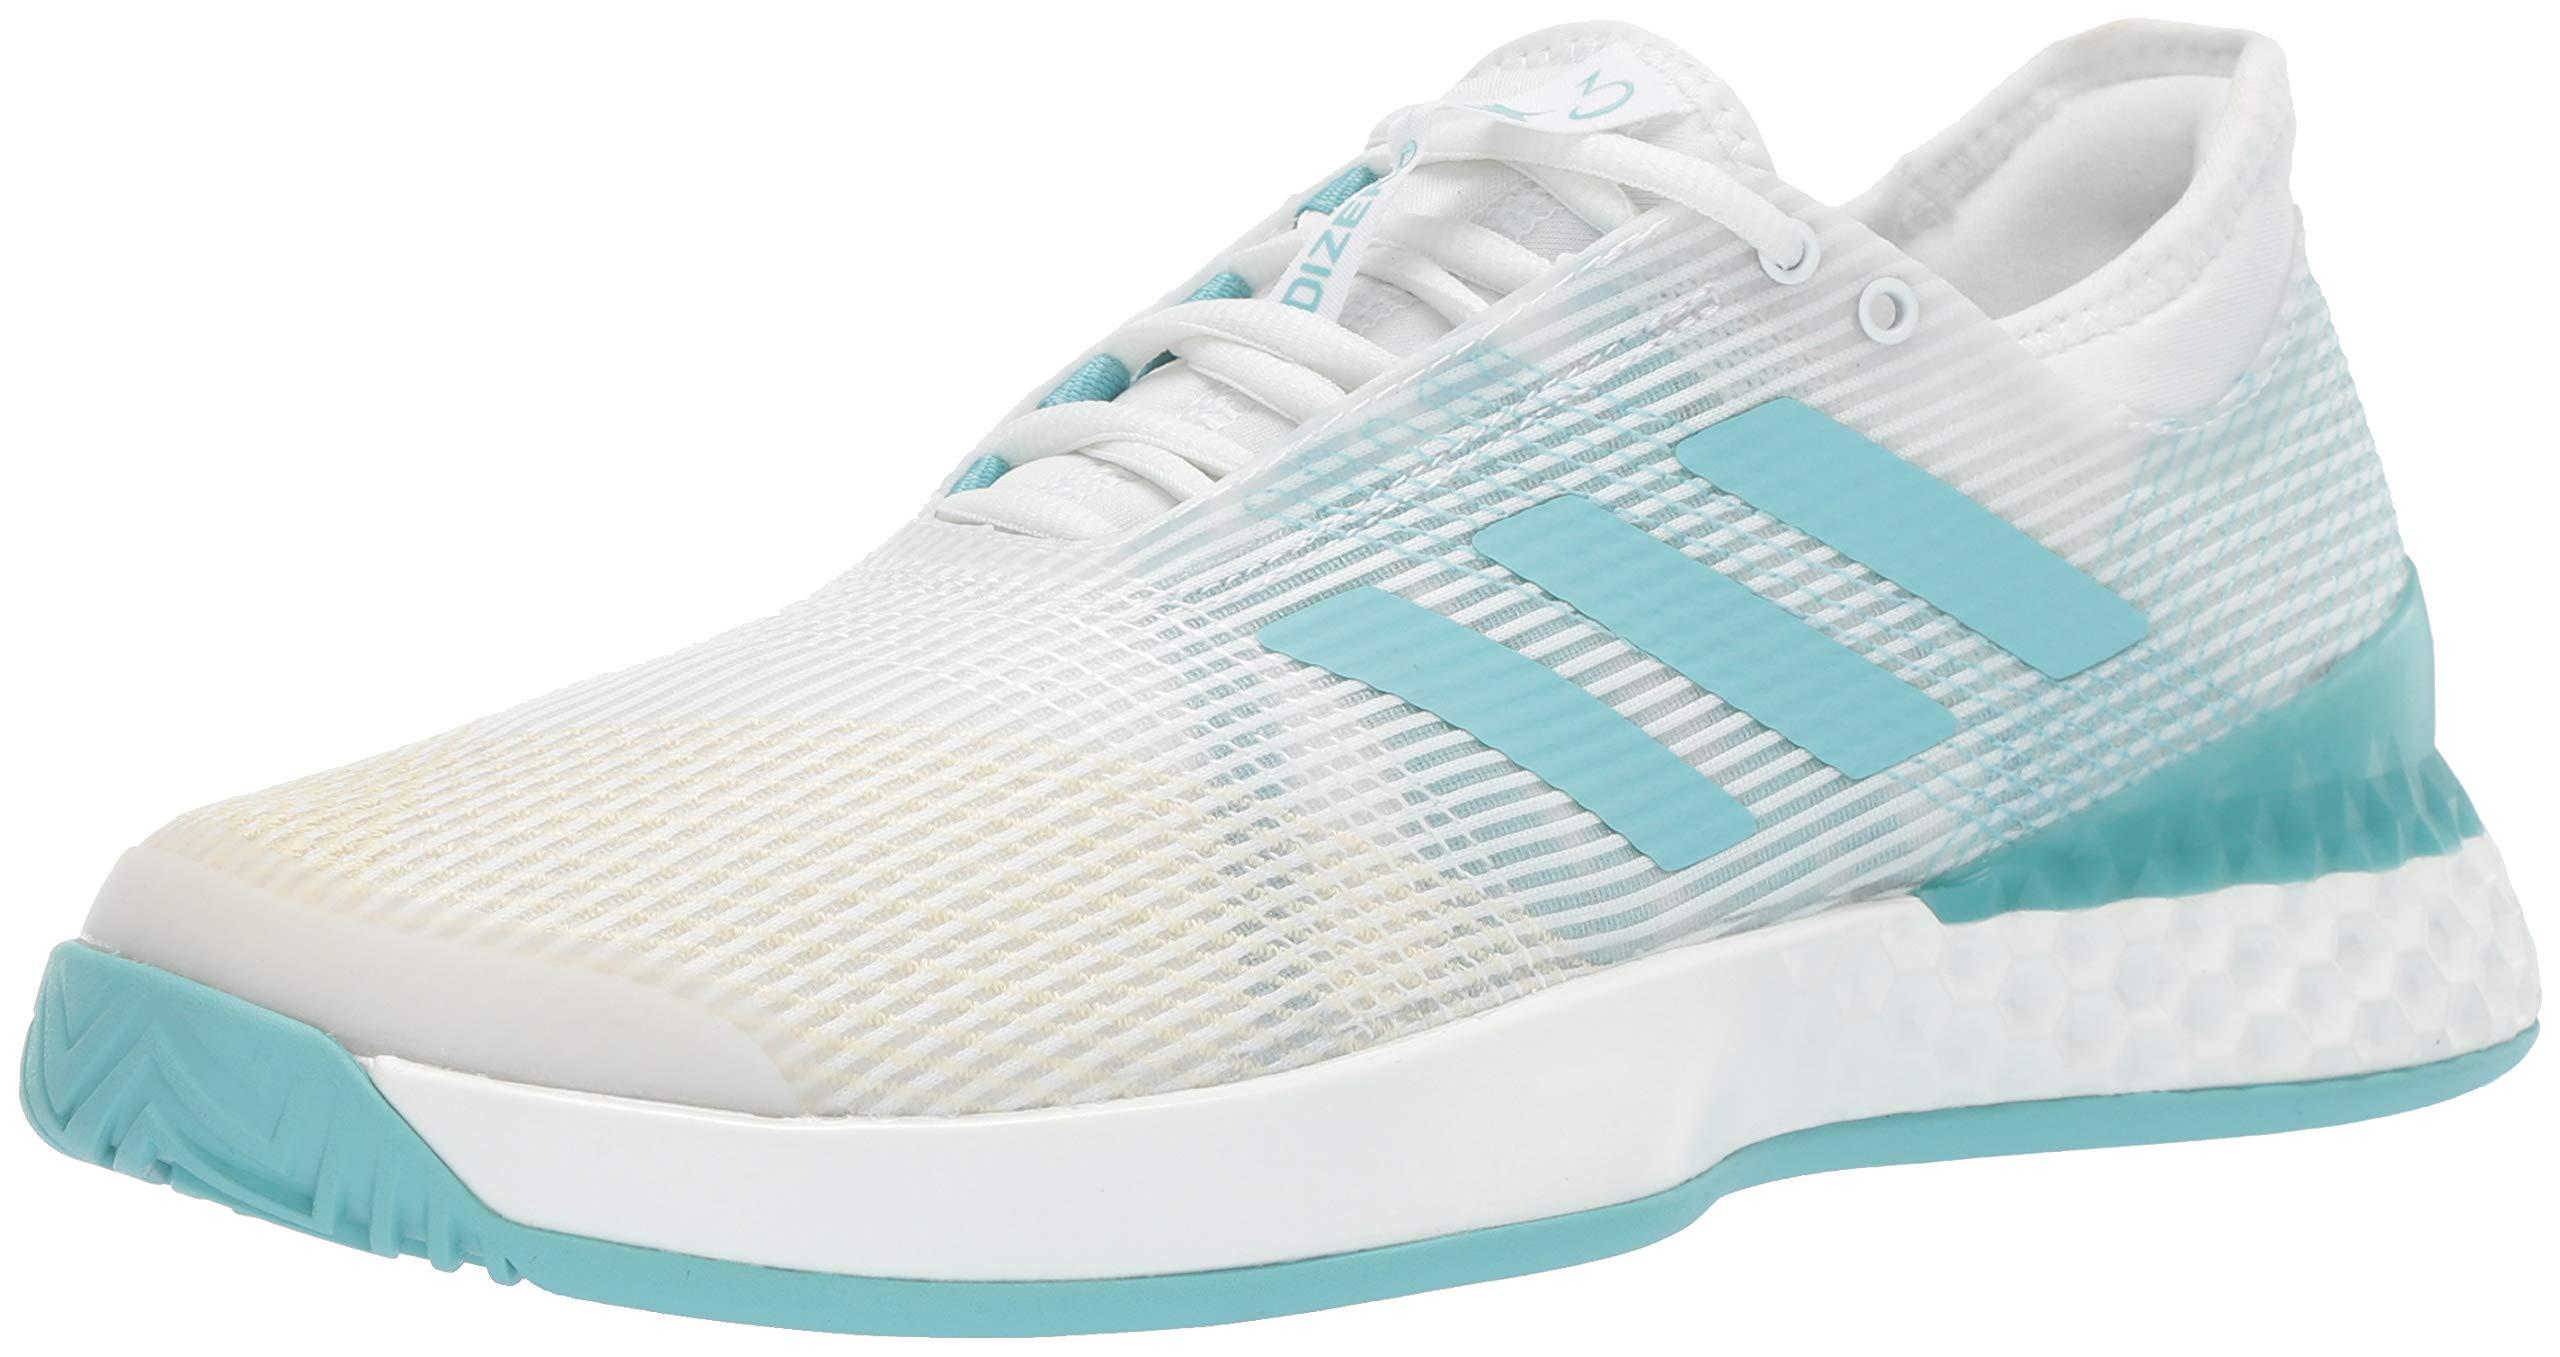 adidas Men's Adizero Ubersonic 3, Blue Spirit/White, 7 M US